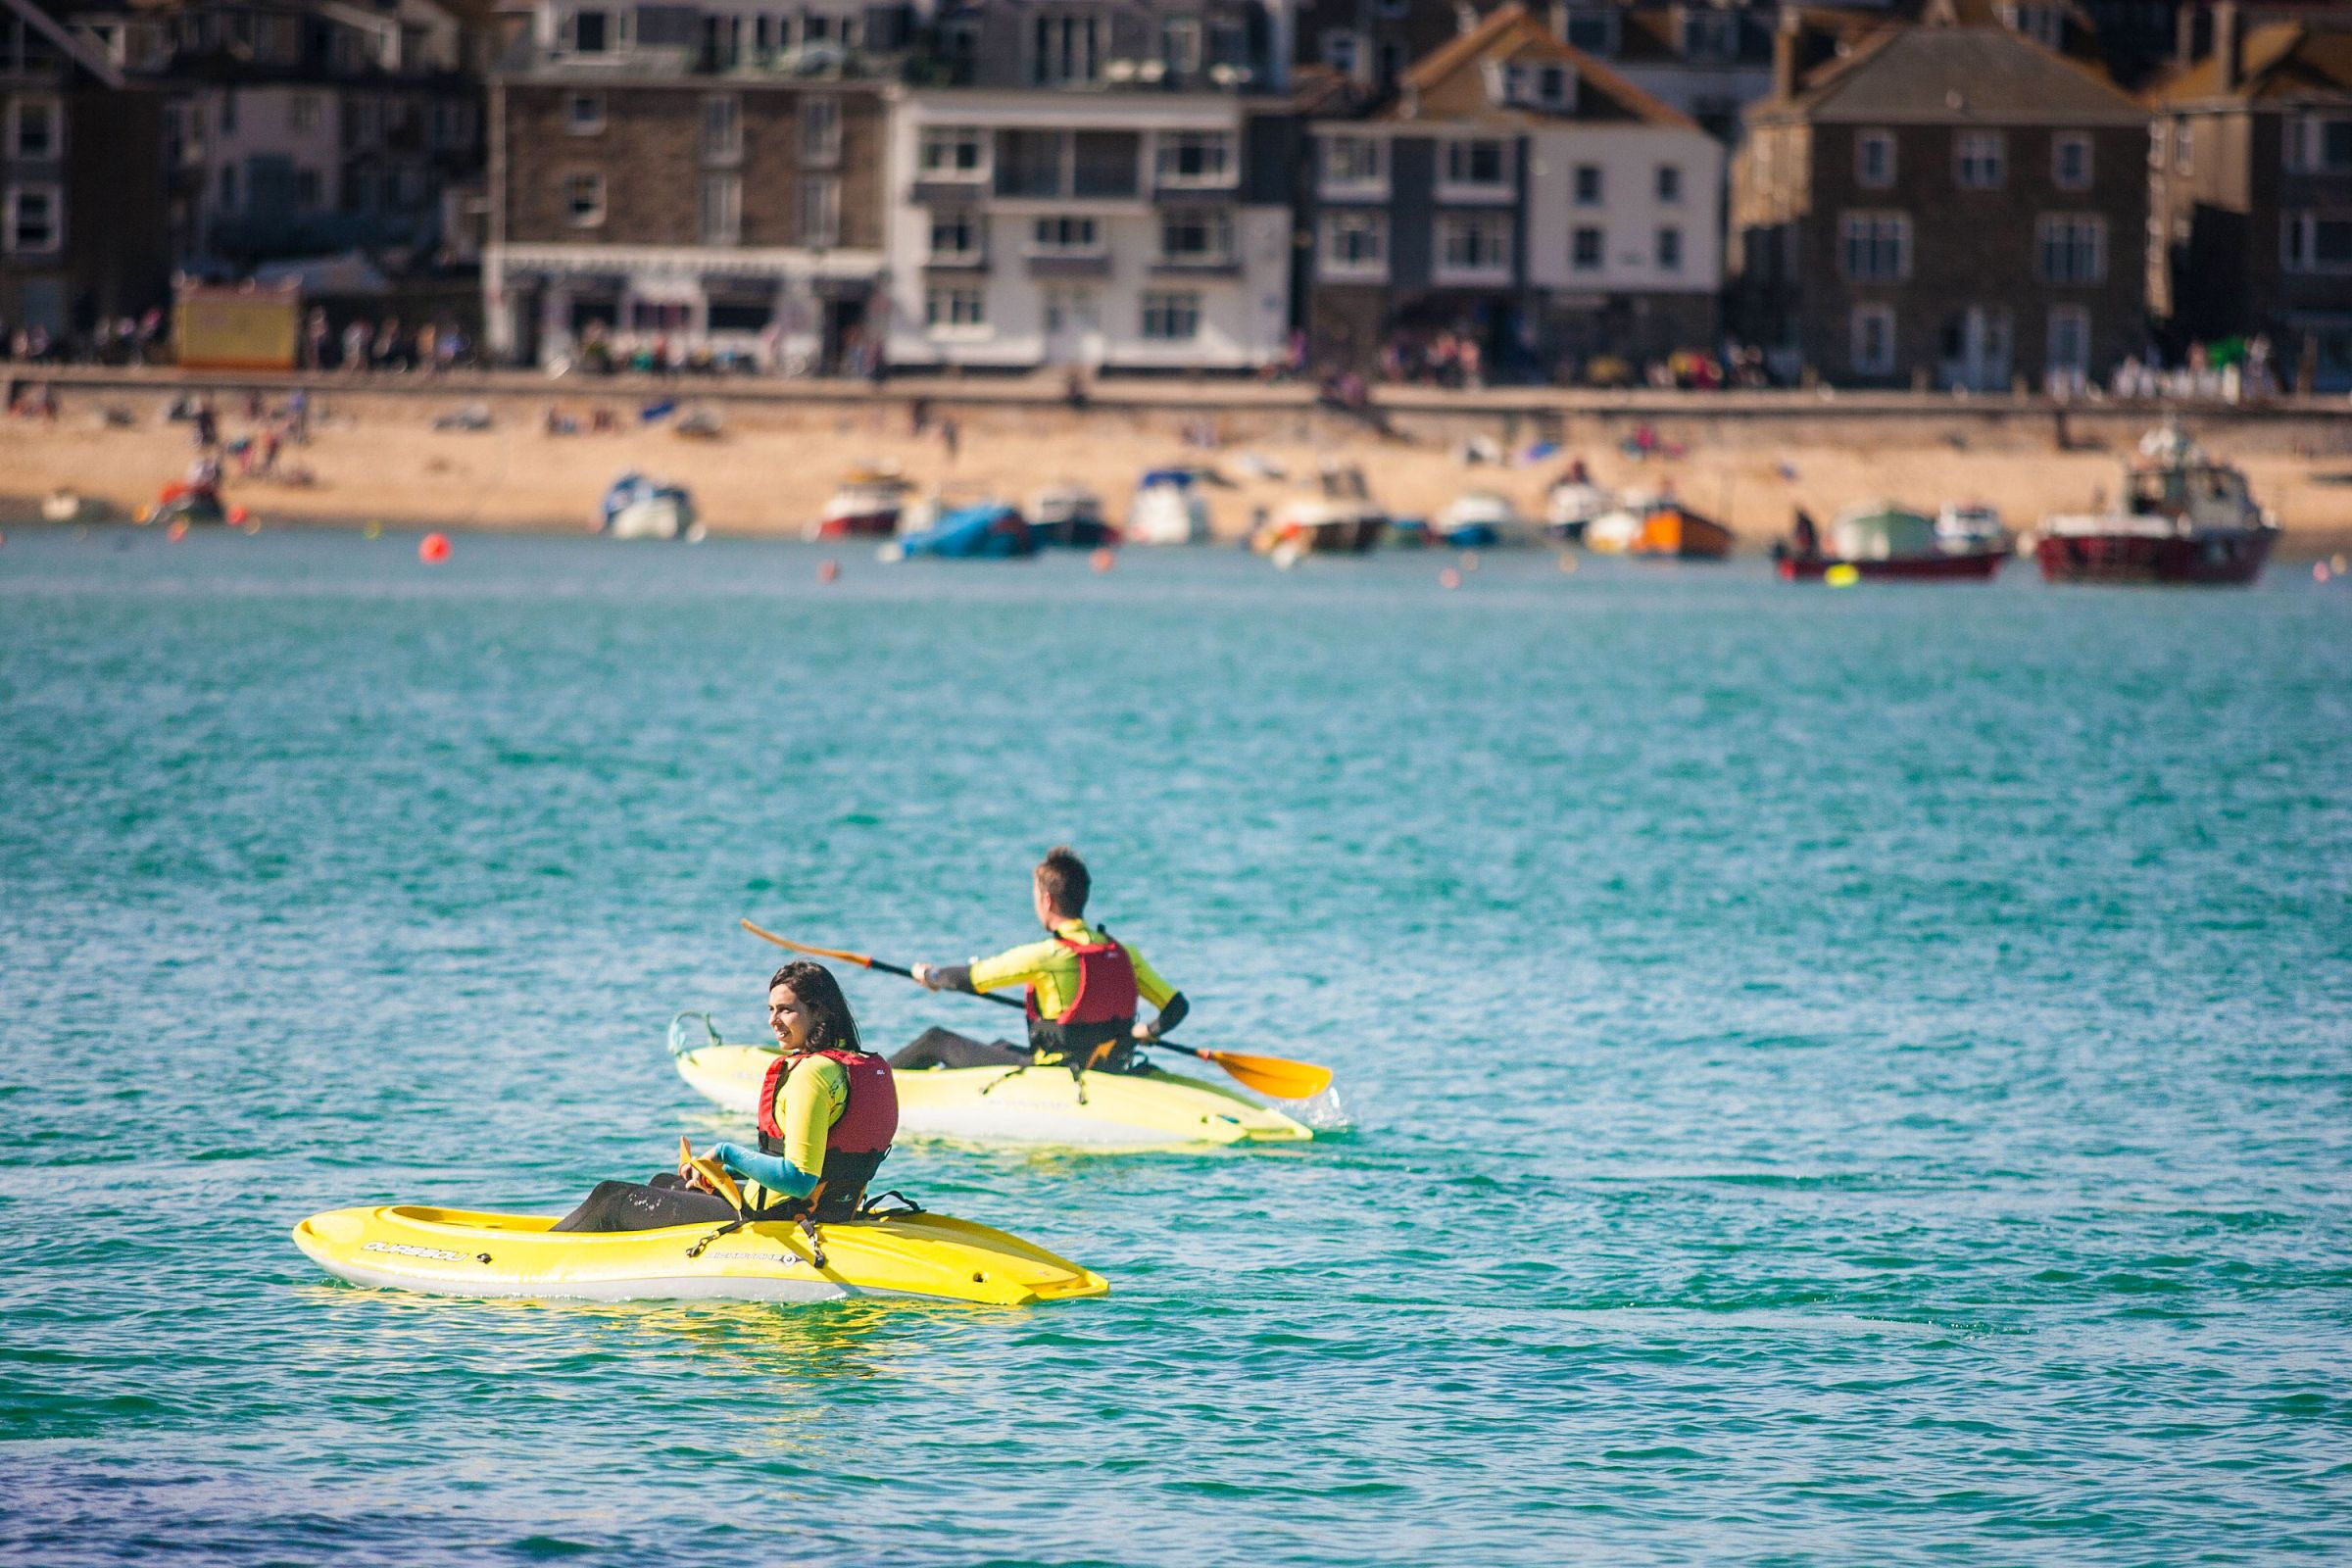 Kayaking in St Ives